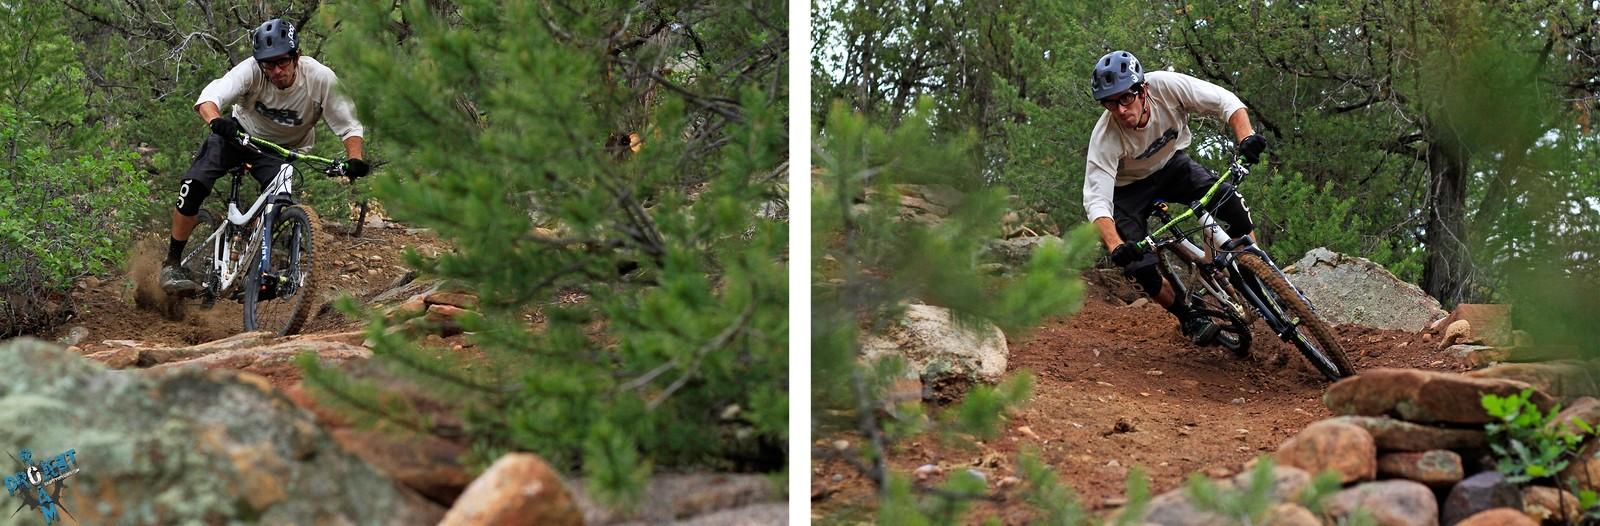 Durango, CO - projekt roam - Mountain Biking Pictures - Vital MTB